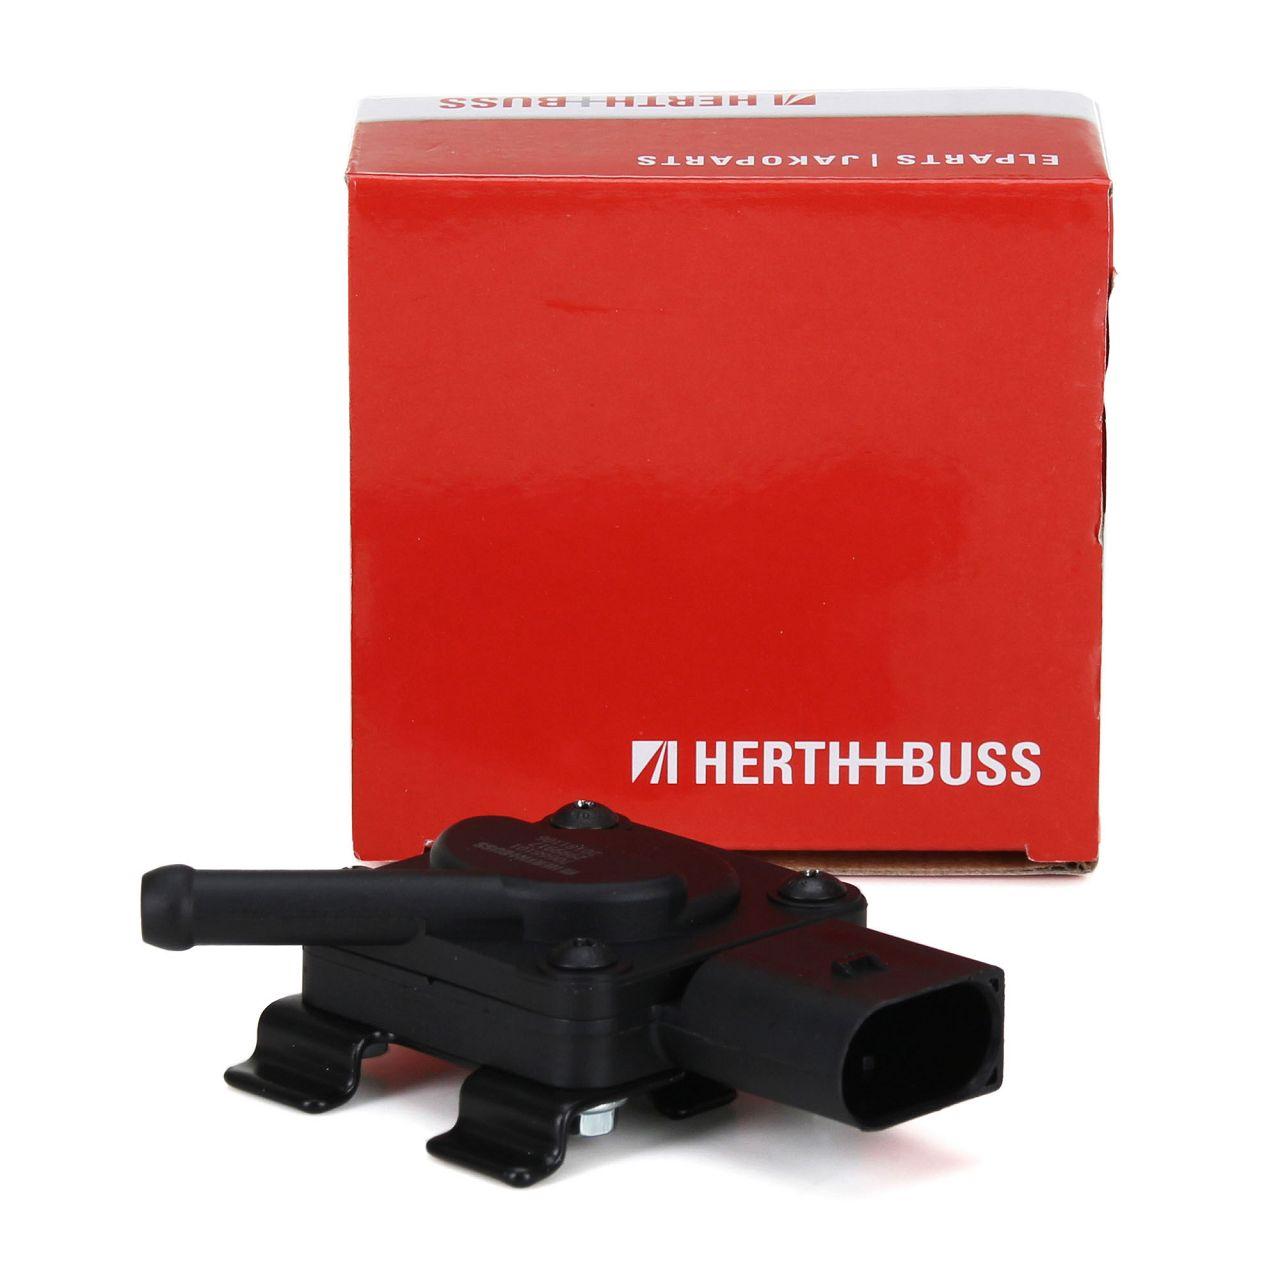 HERTH+BUSS ELPARTS Abgasdrucksensor BMW E87 E90 E91 E92 E93 E60 E61 E65-67 X3 X5